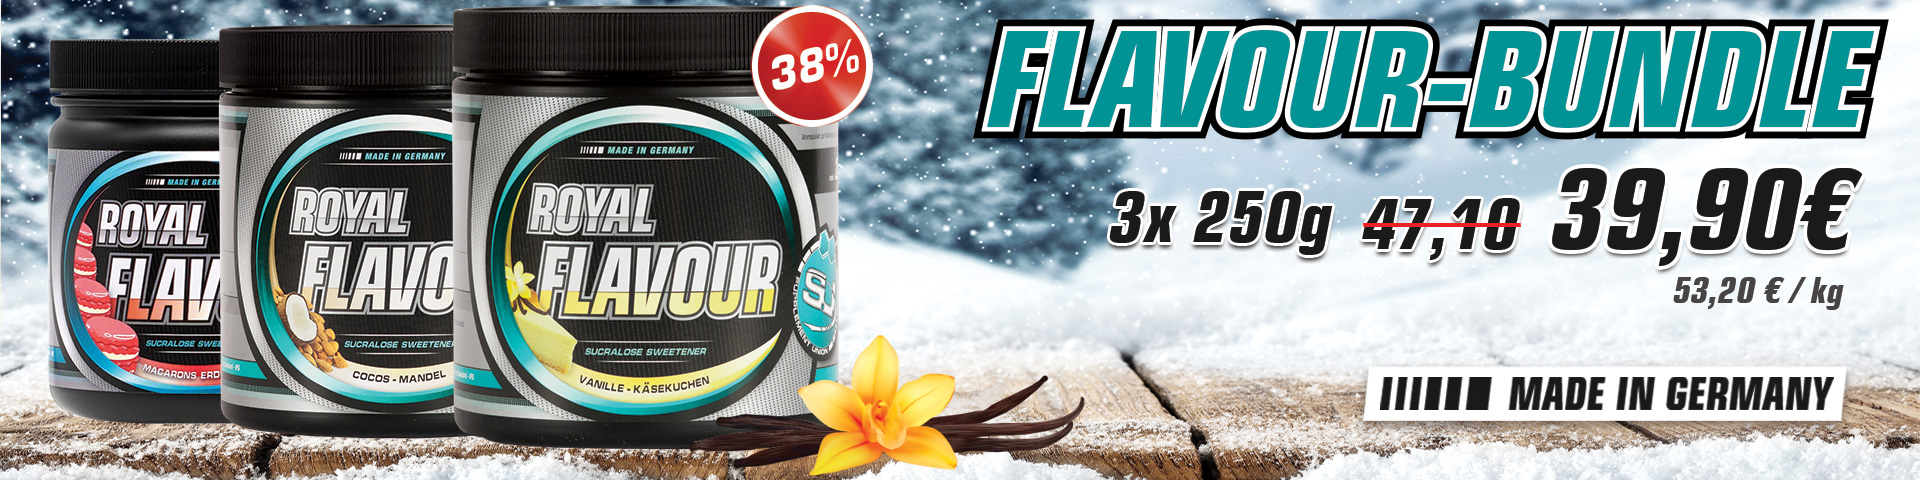 flavour-bundle-januar-1.jpg